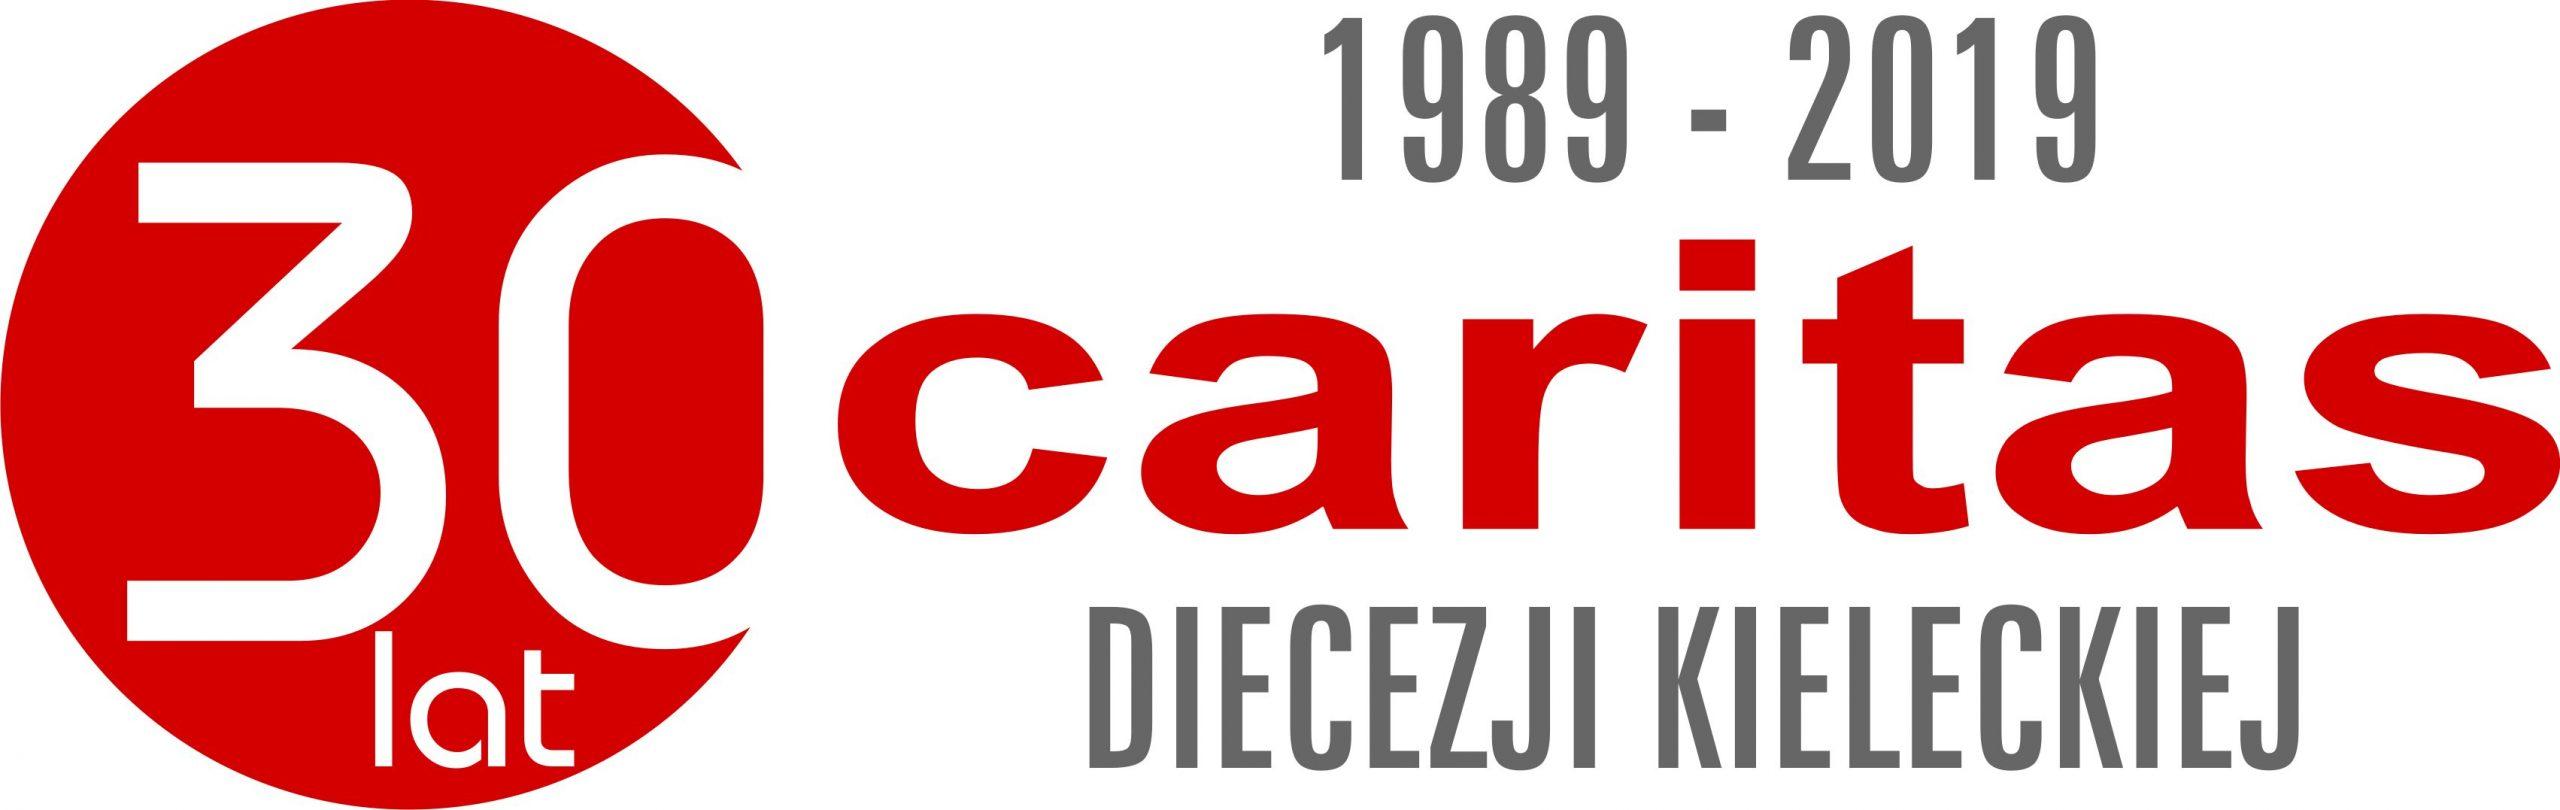 Caritas Diecezji Kieleckiej